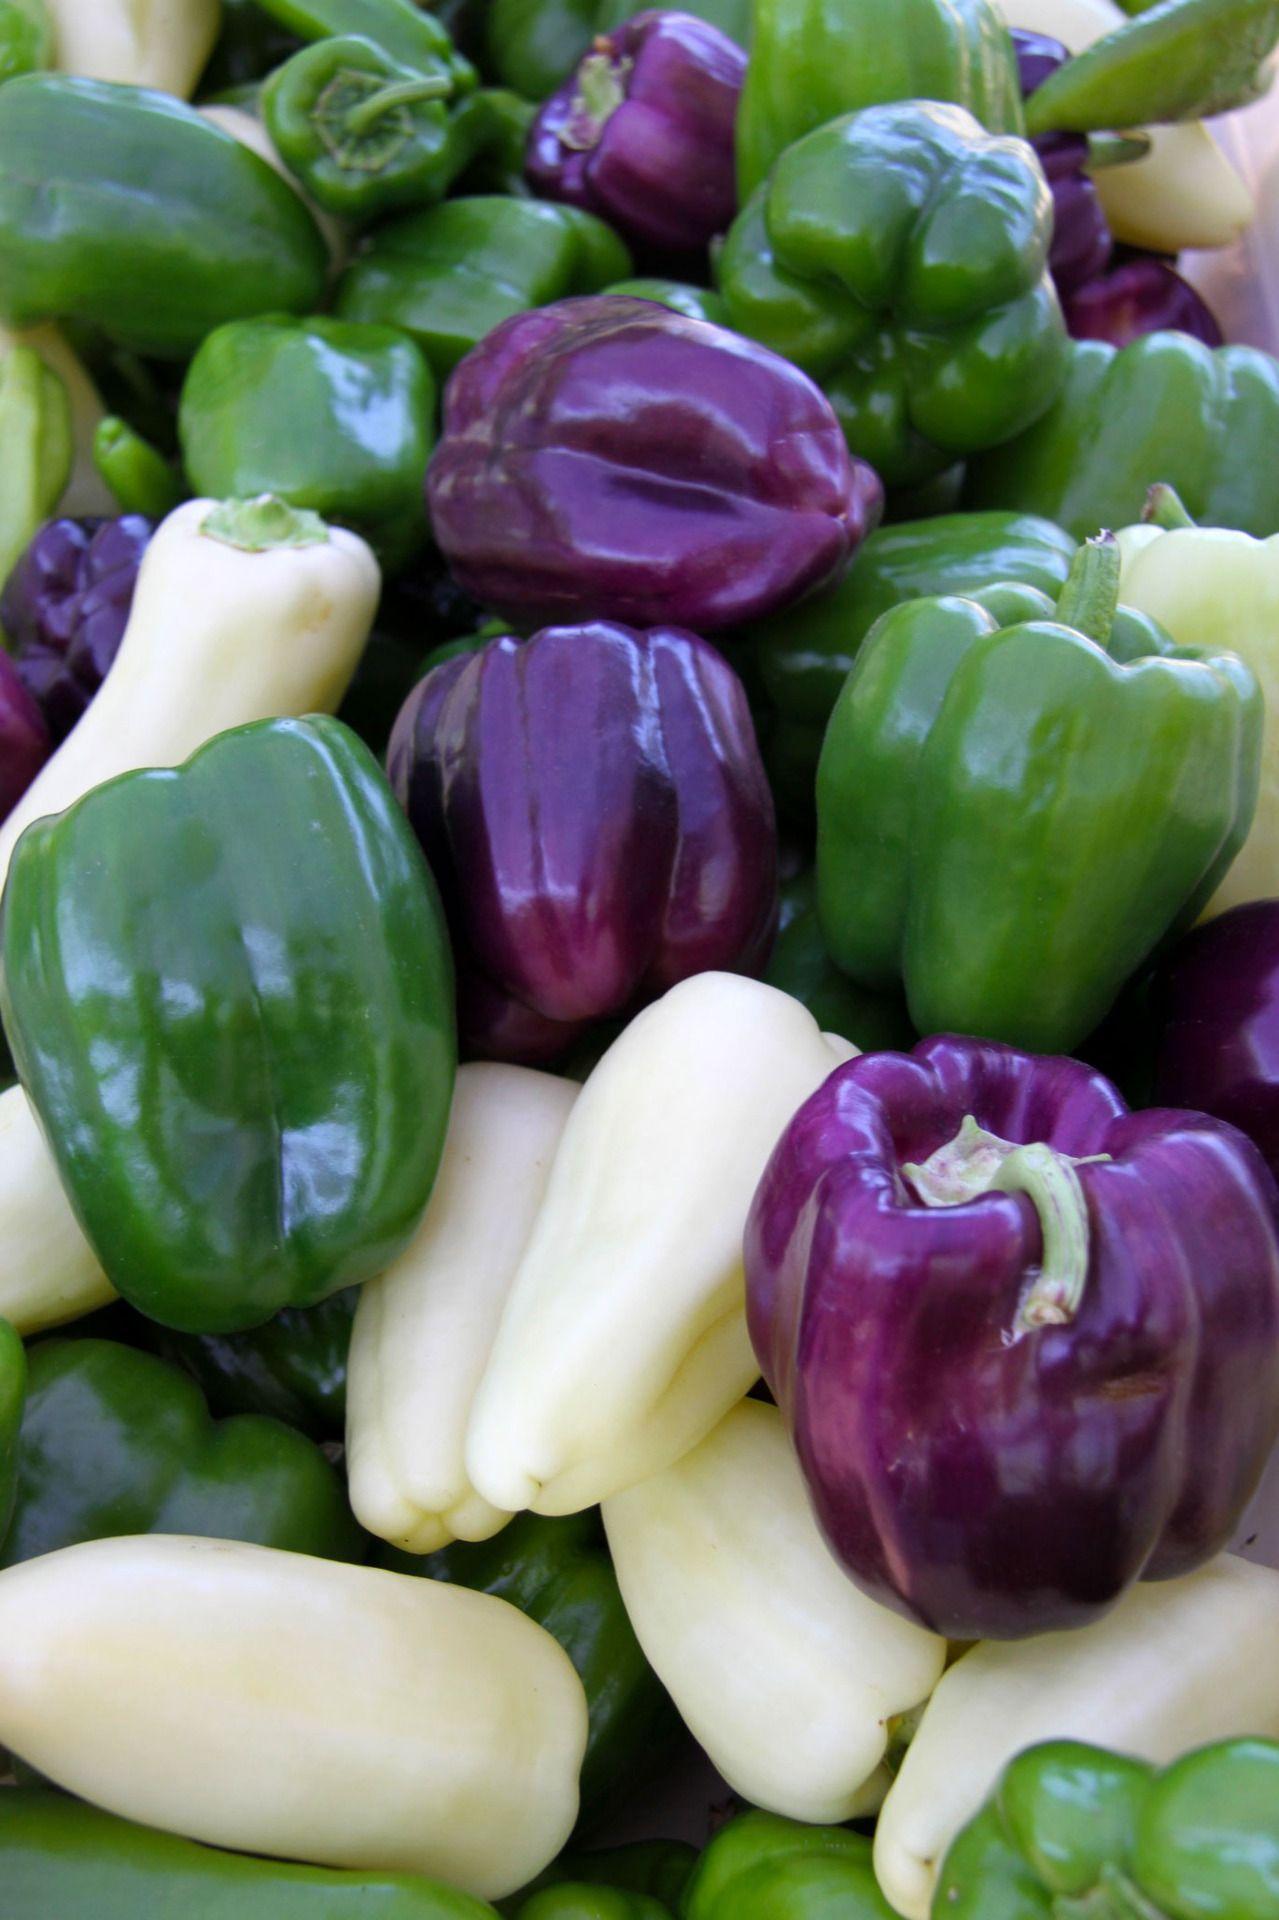 all non-gmo heirloom vegetable seeds! 25 PURPLE BEAUTY SWEET PEPPER 2020